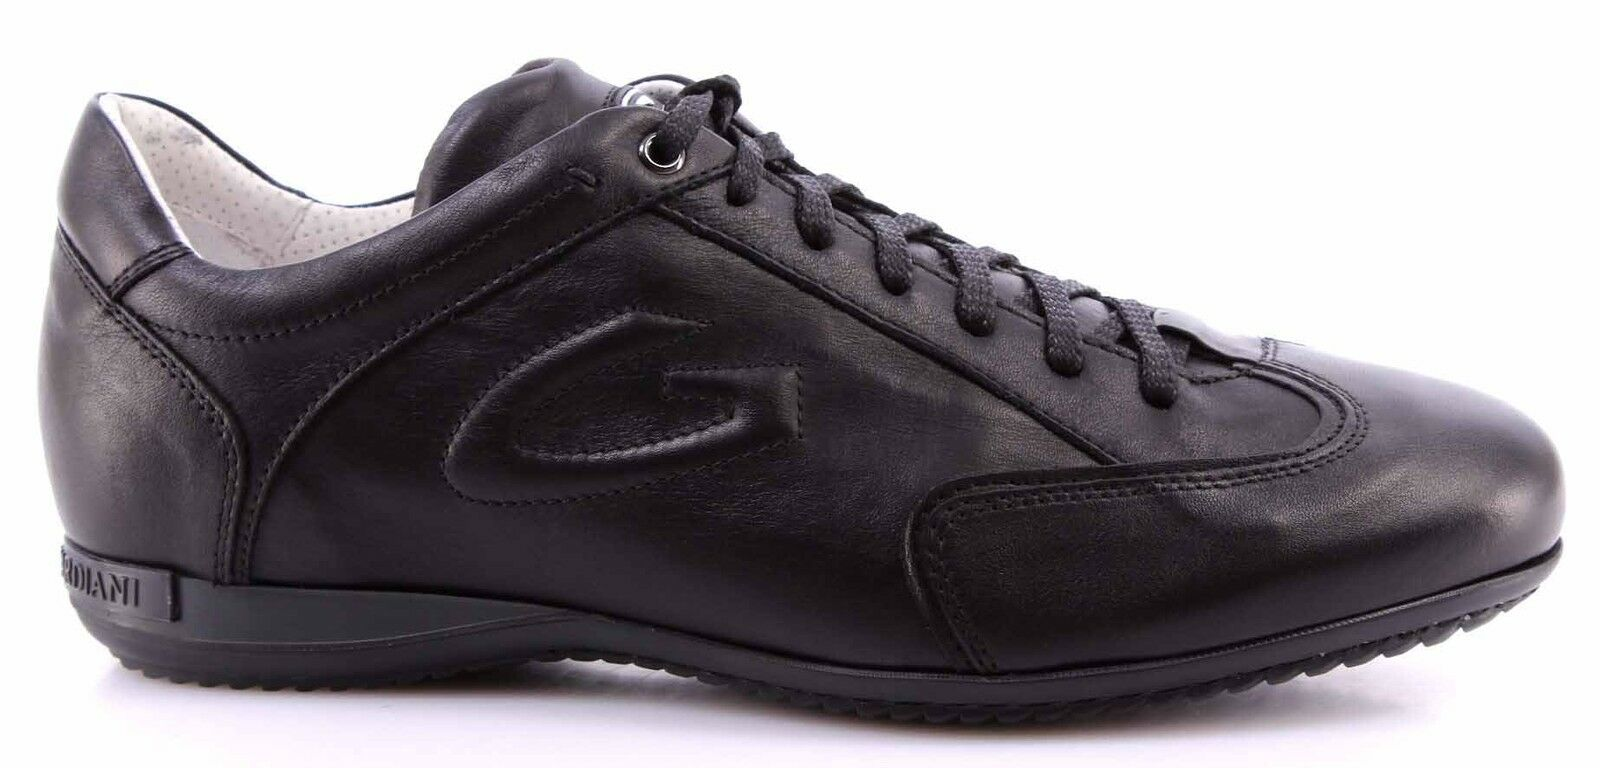 Herren Schuhe Sneakers ALBERTO GUARDIANI Sport Man Shoe Adler Schwarz Made Italy